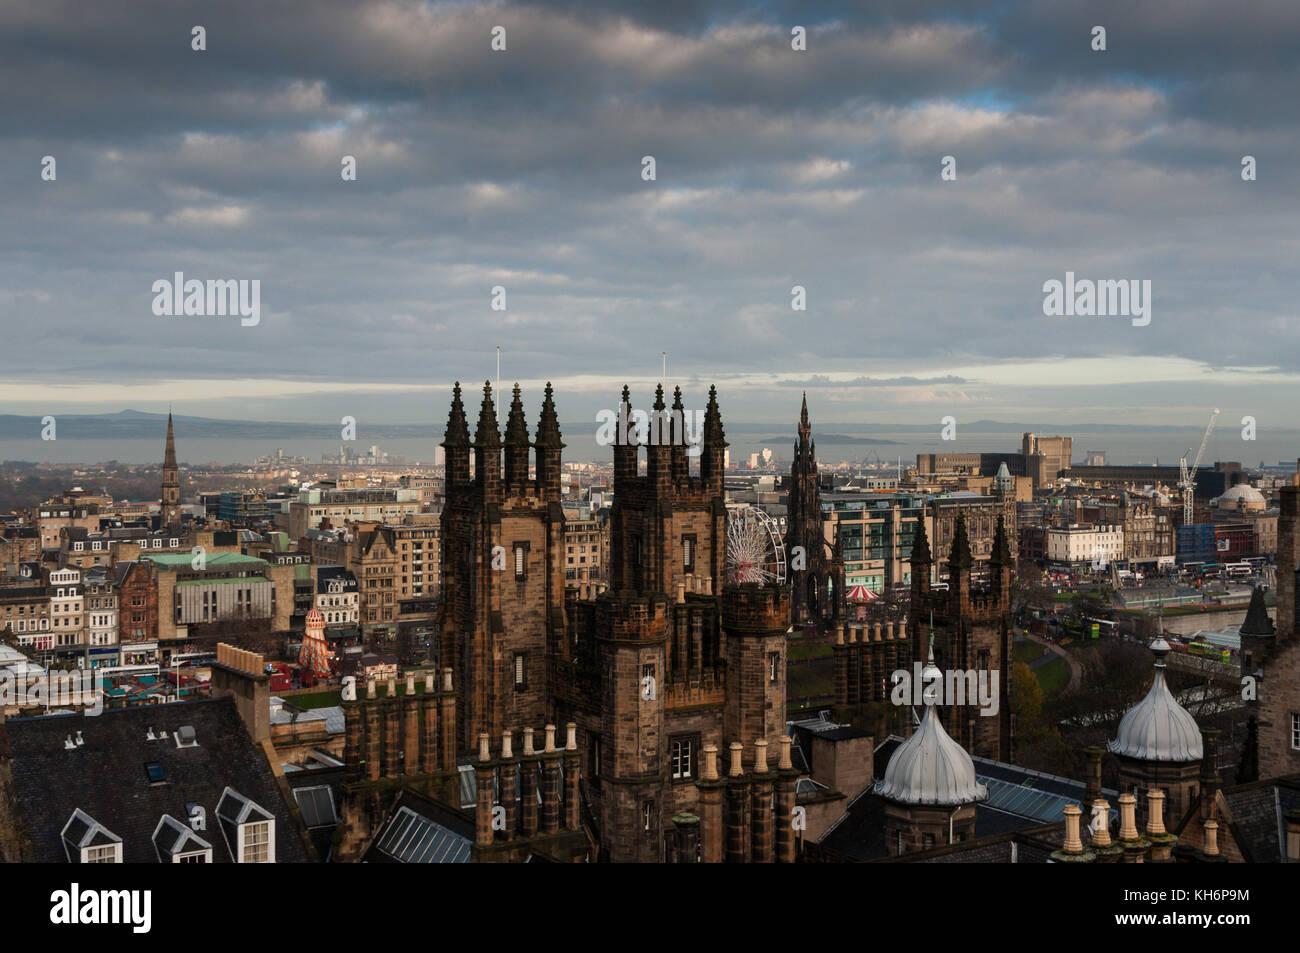 The skyline from Edinburg Castle showing the Walter Scott Monument - Stock Image